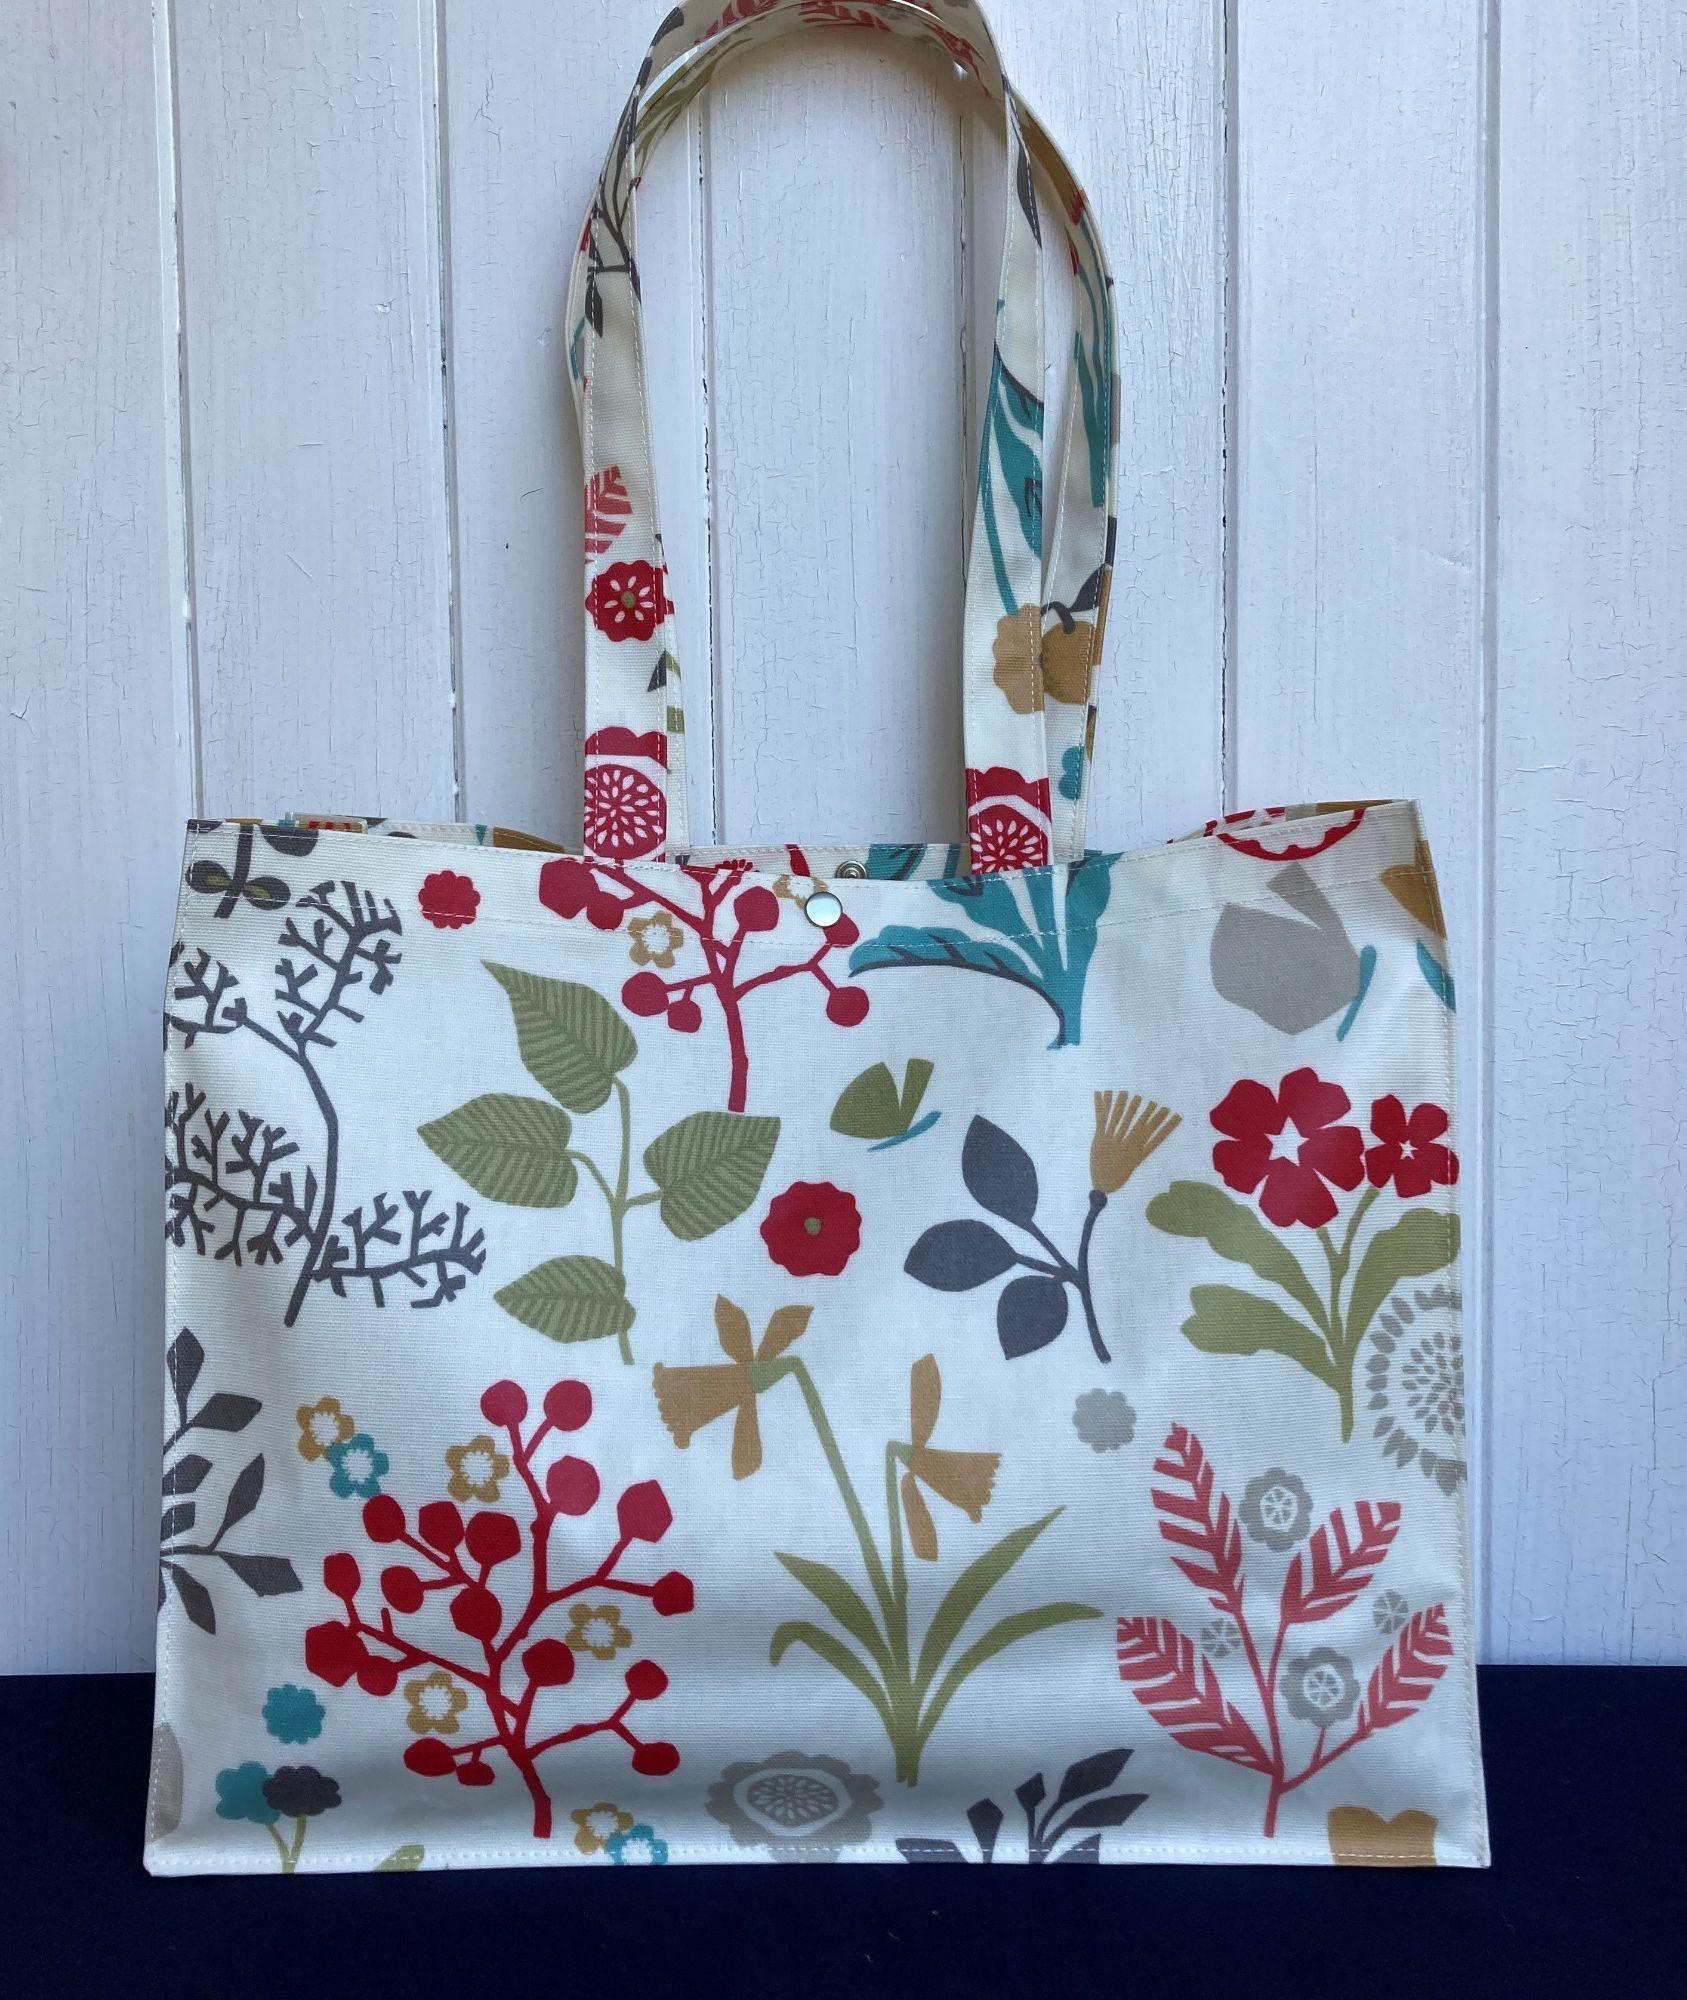 bag2 (3).jpg